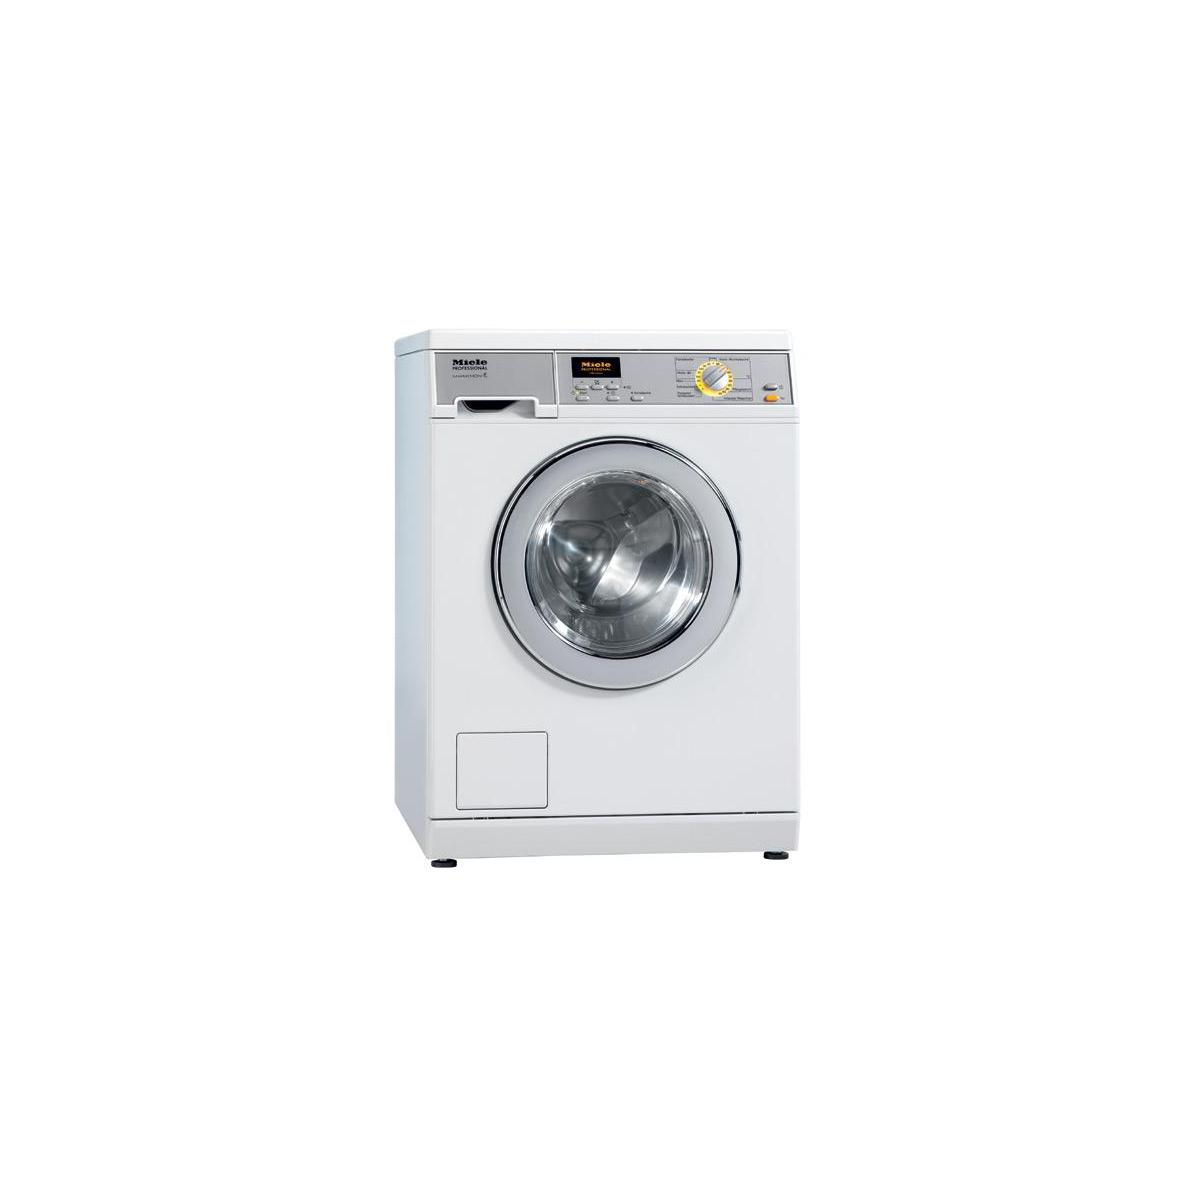 miele professional 6 5kg washing machine pw5062dp13. Black Bedroom Furniture Sets. Home Design Ideas